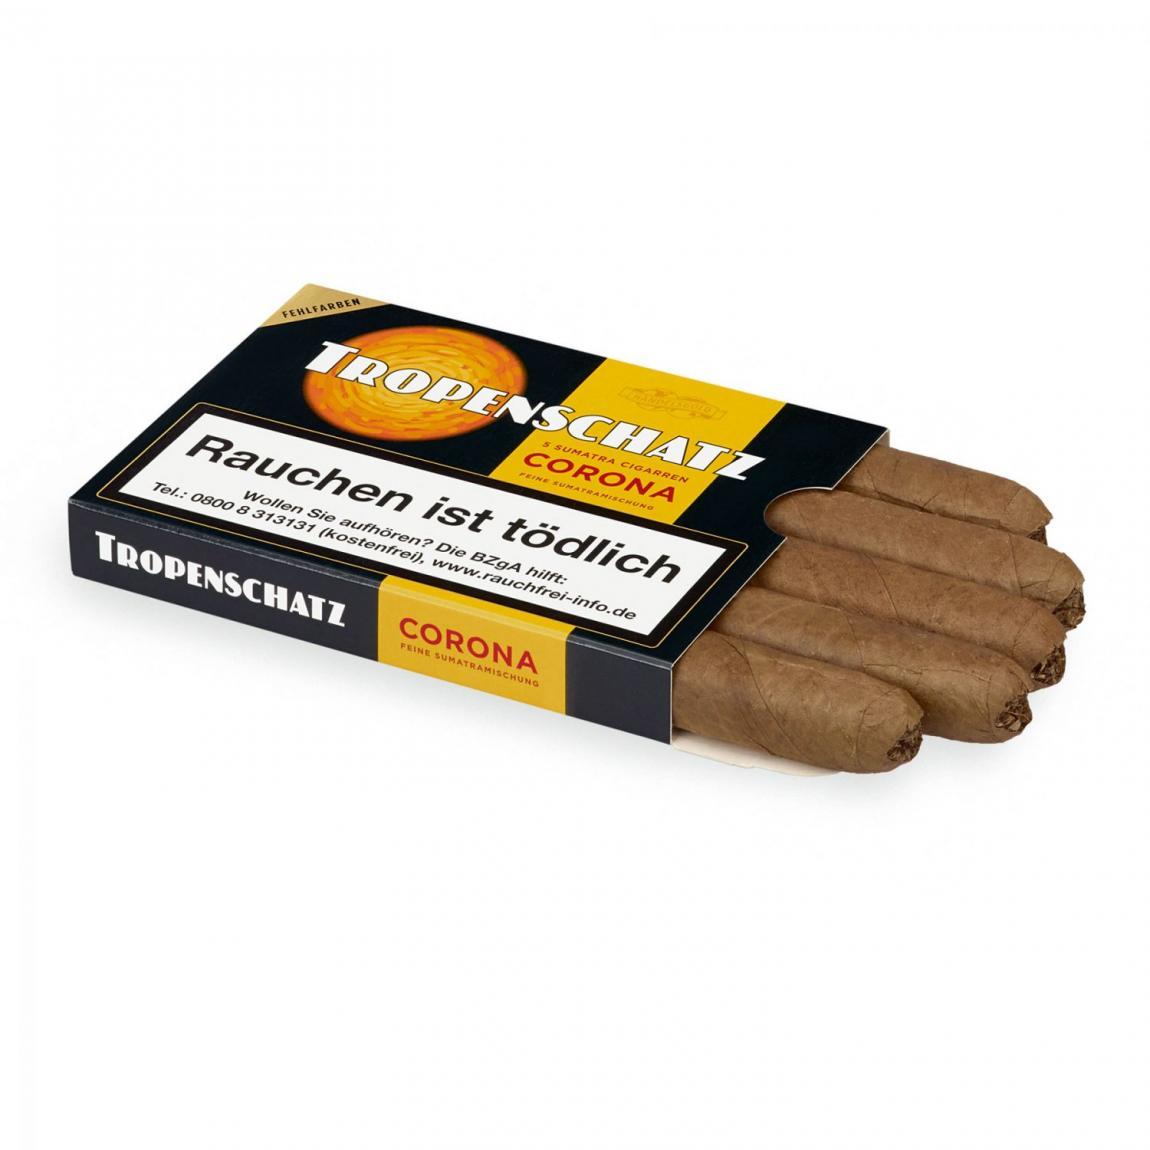 Handelsgold »Tropenschatz« Coronas Sumatra 421, 5er Schachtel